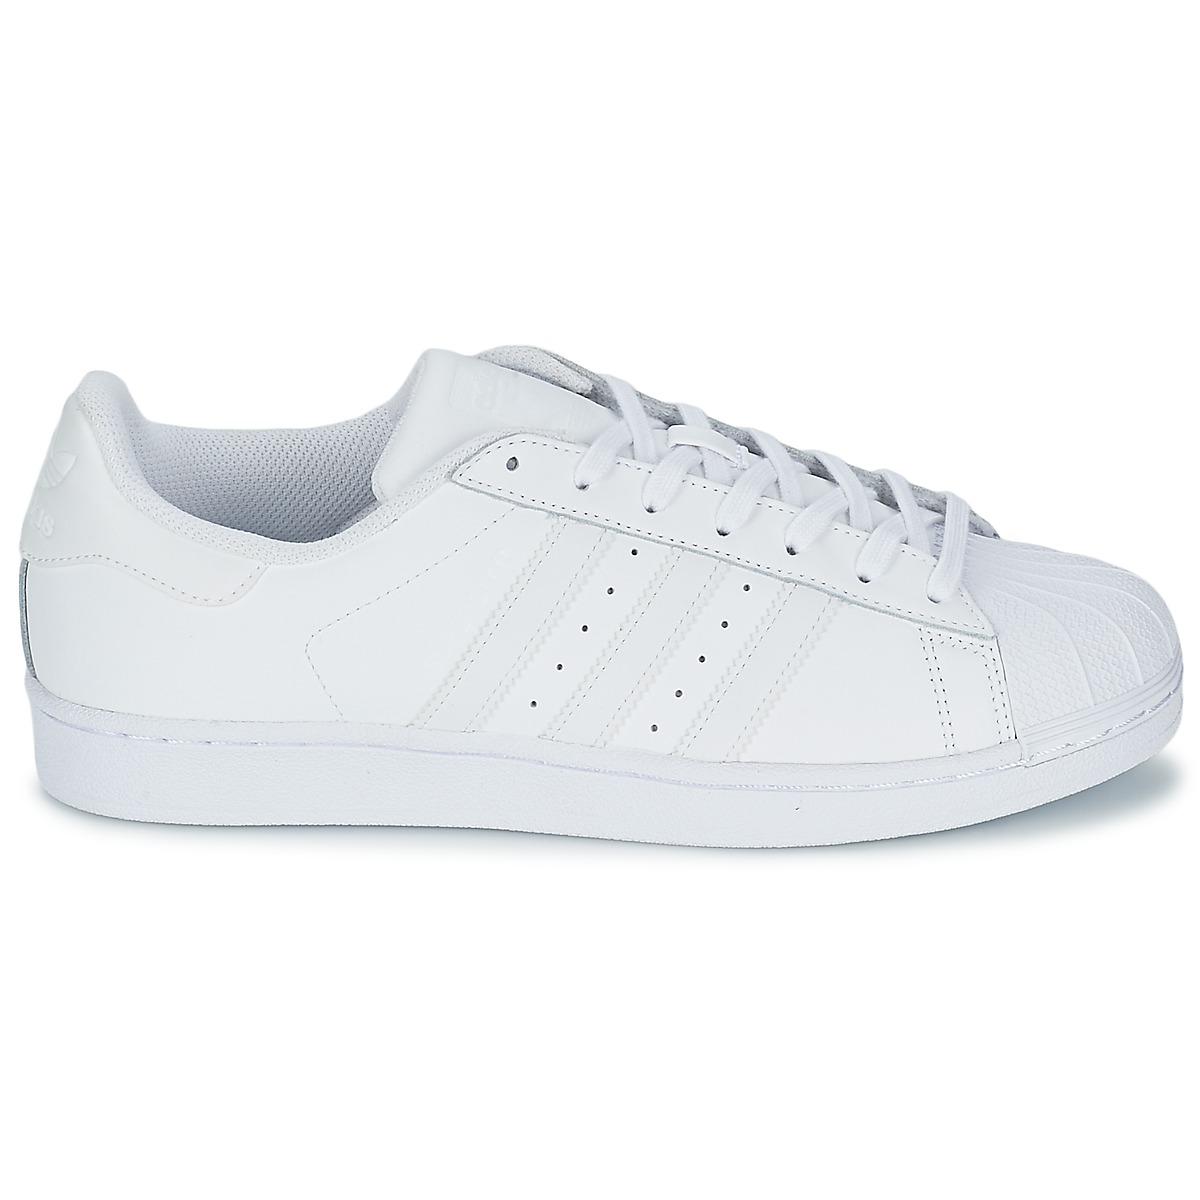 Superstar Adidas Basses Baskets Foundatio Adidas nwkP08XNO